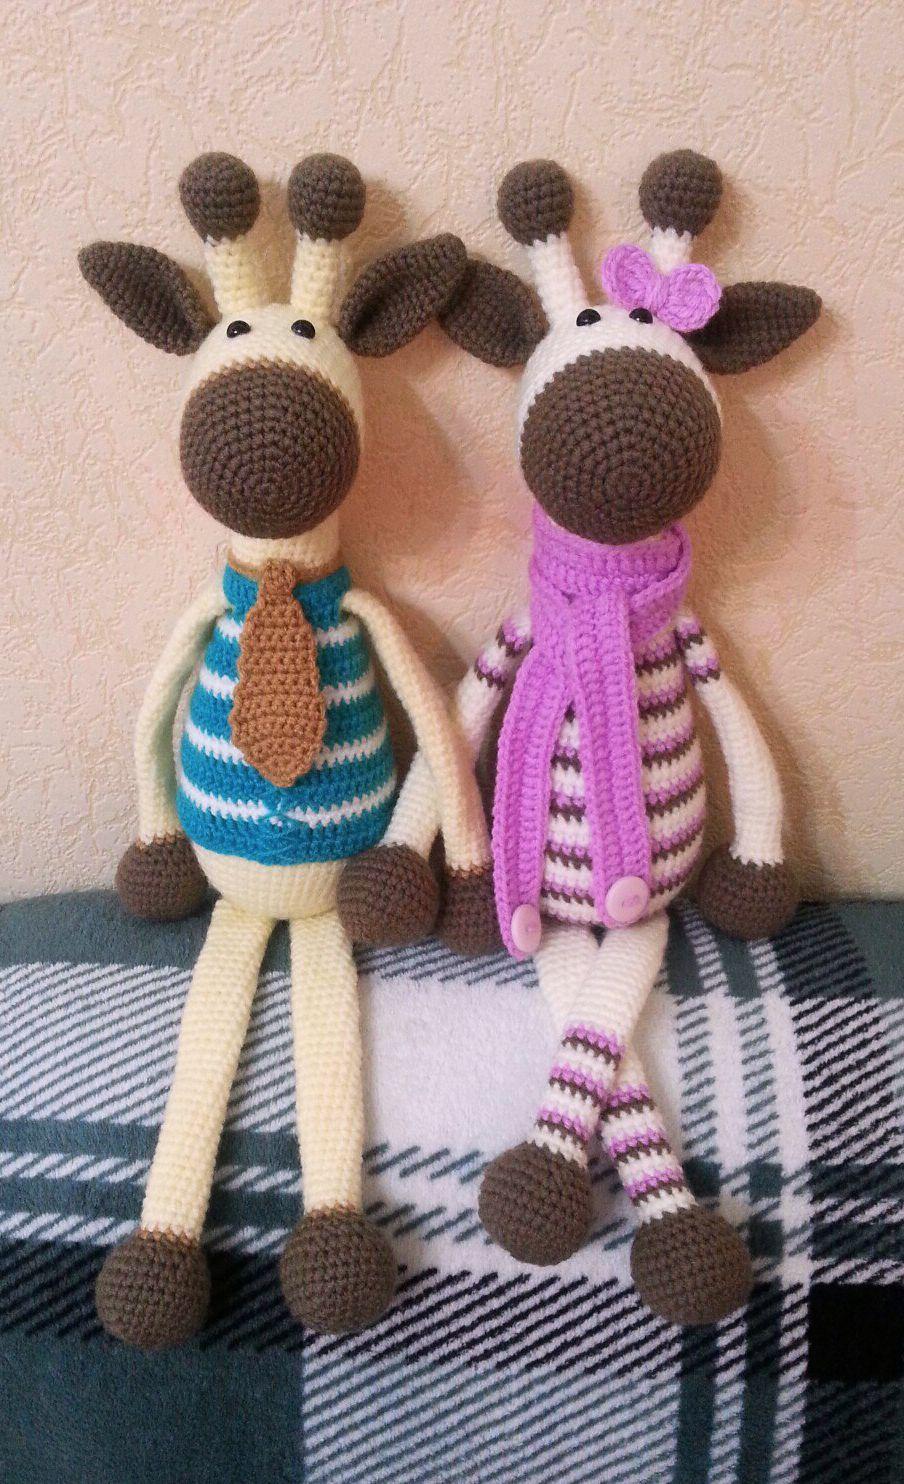 Amigurumi Knitting 🦒JIRAFA AMIGURUMI 🦒- CROCHET- FÁCIL ... | 1484x904